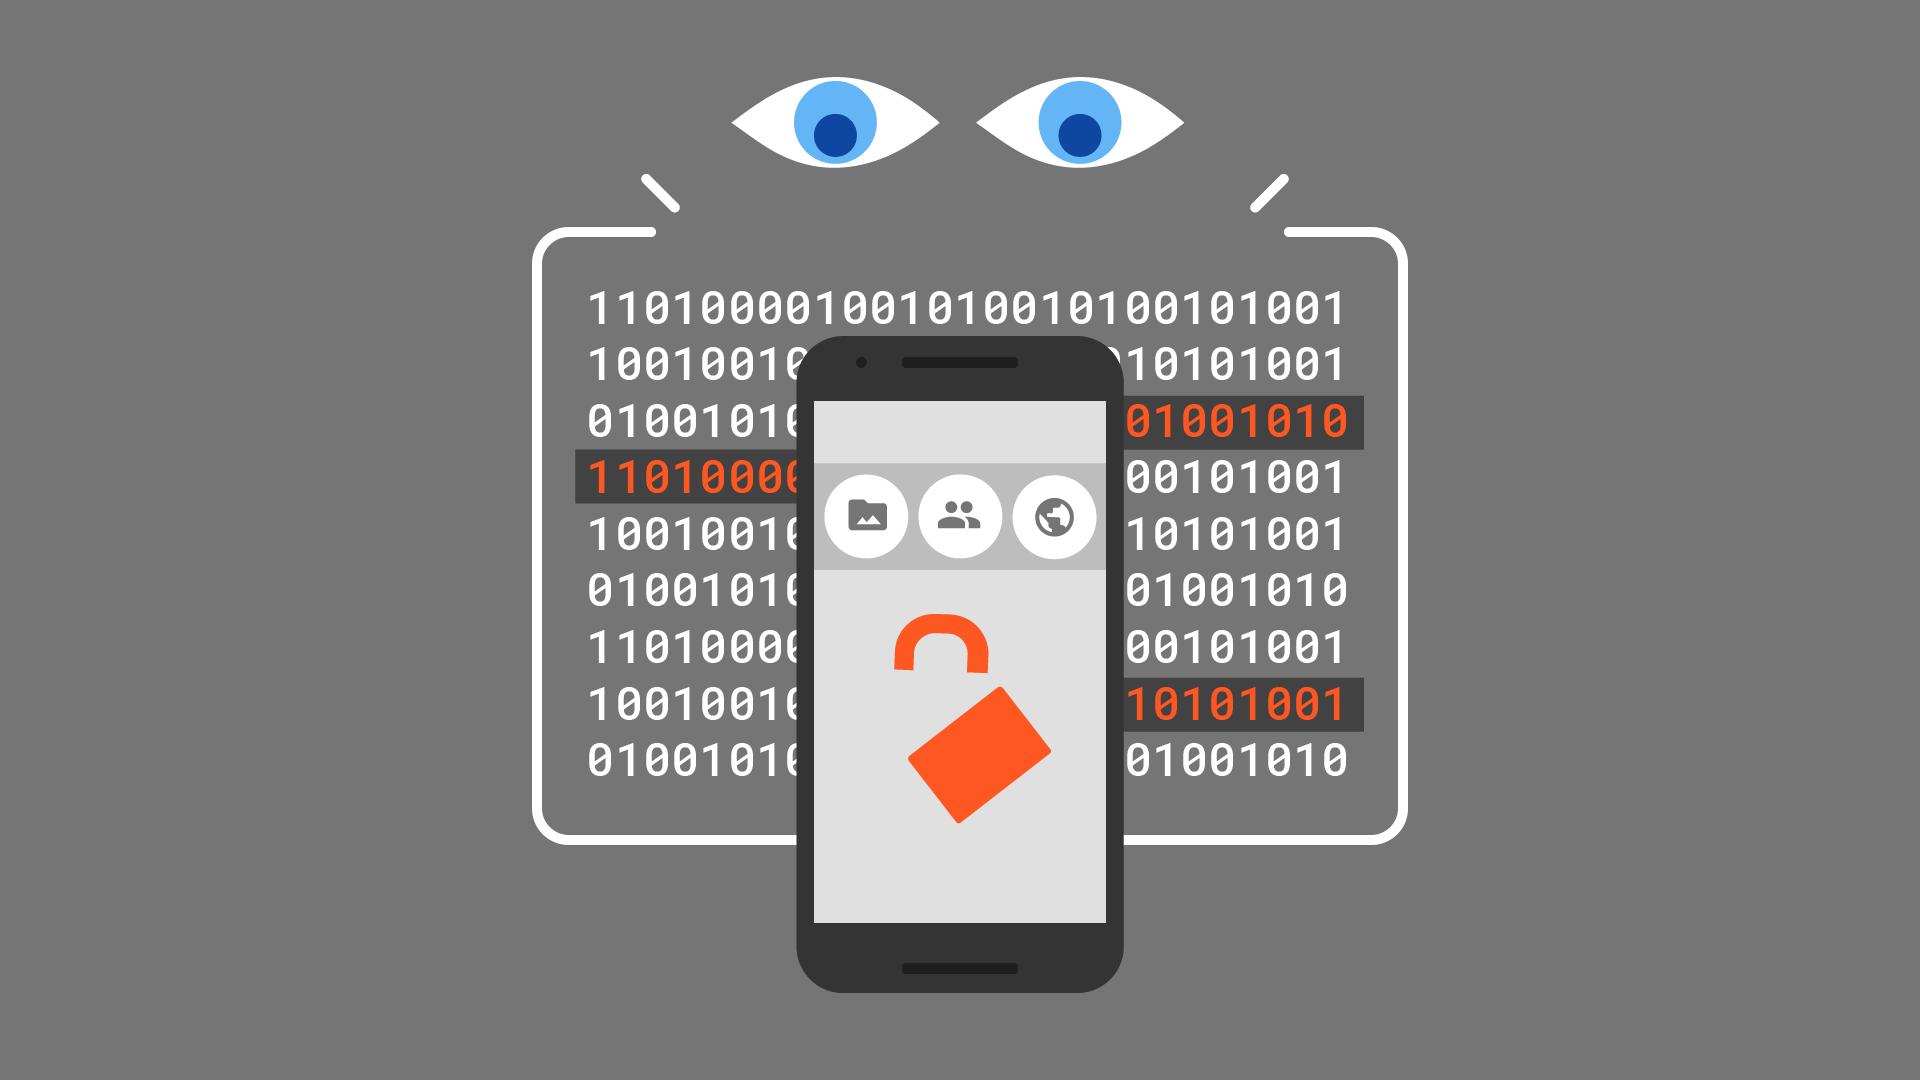 मोबाइल सुरक्षा का चित्रण